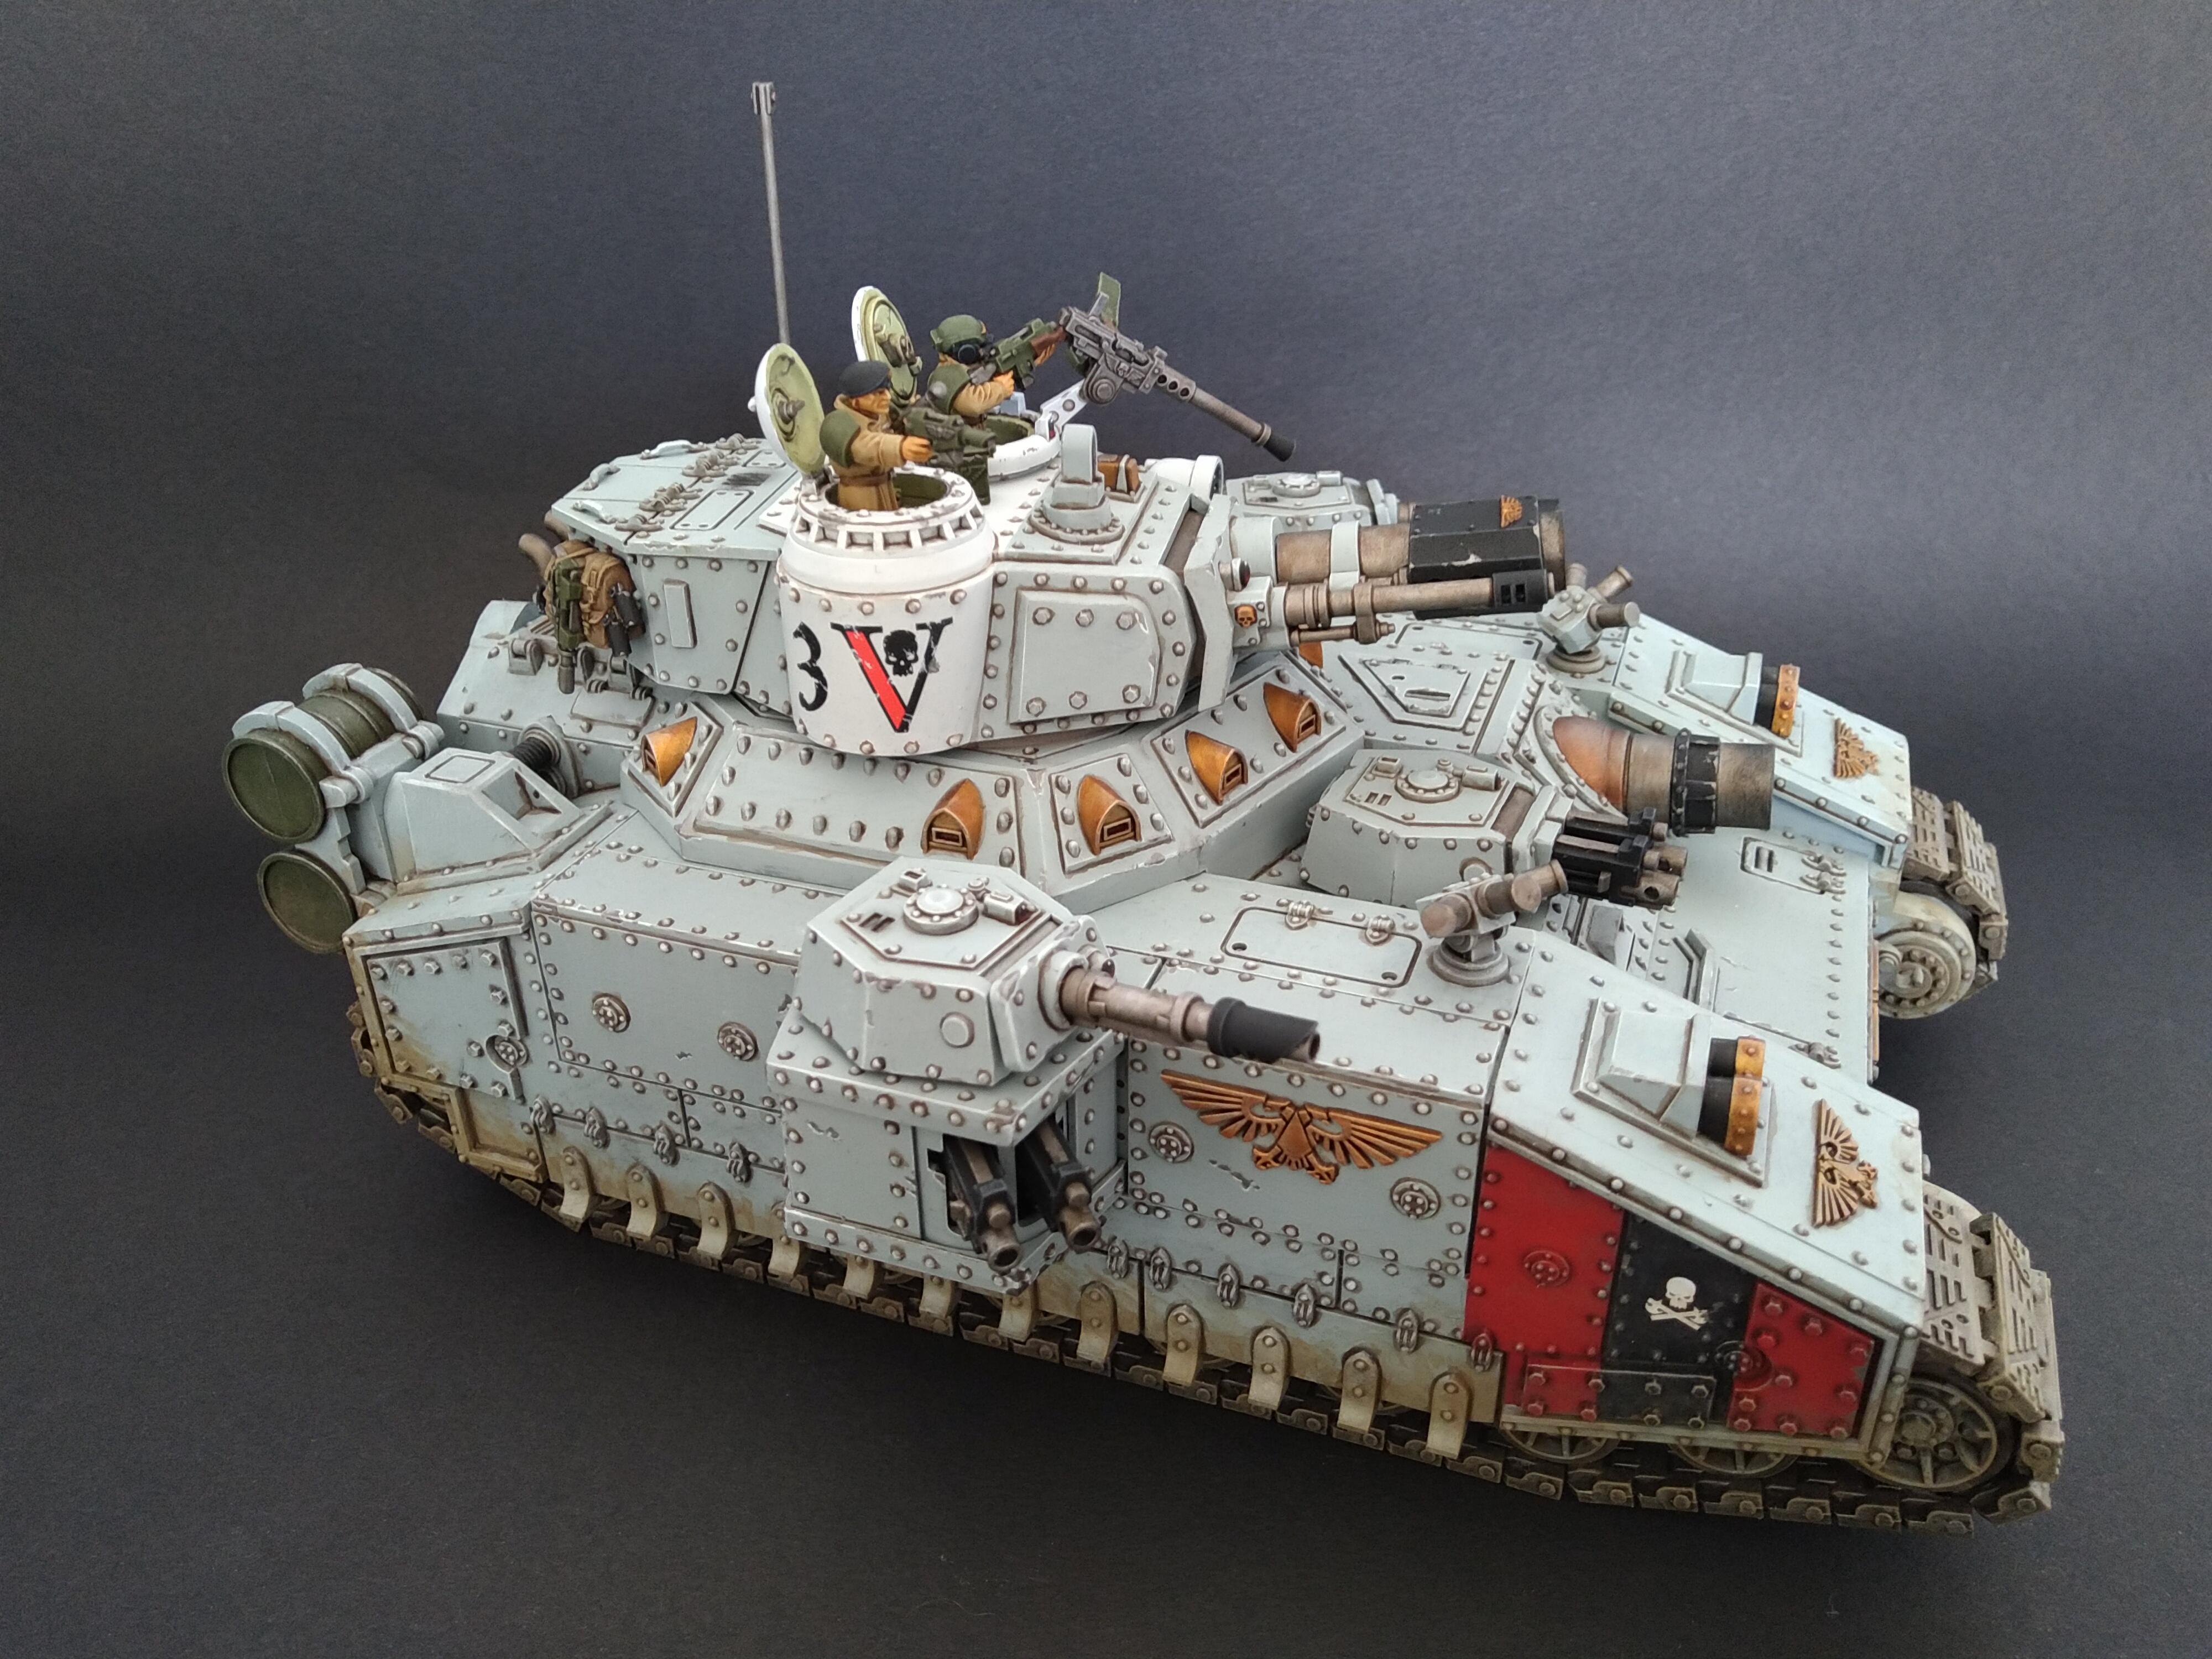 Am, Astra Militarum, Baneblade, Grey, Hellhammer, Magnetised, Tank, Warhammer 40,000